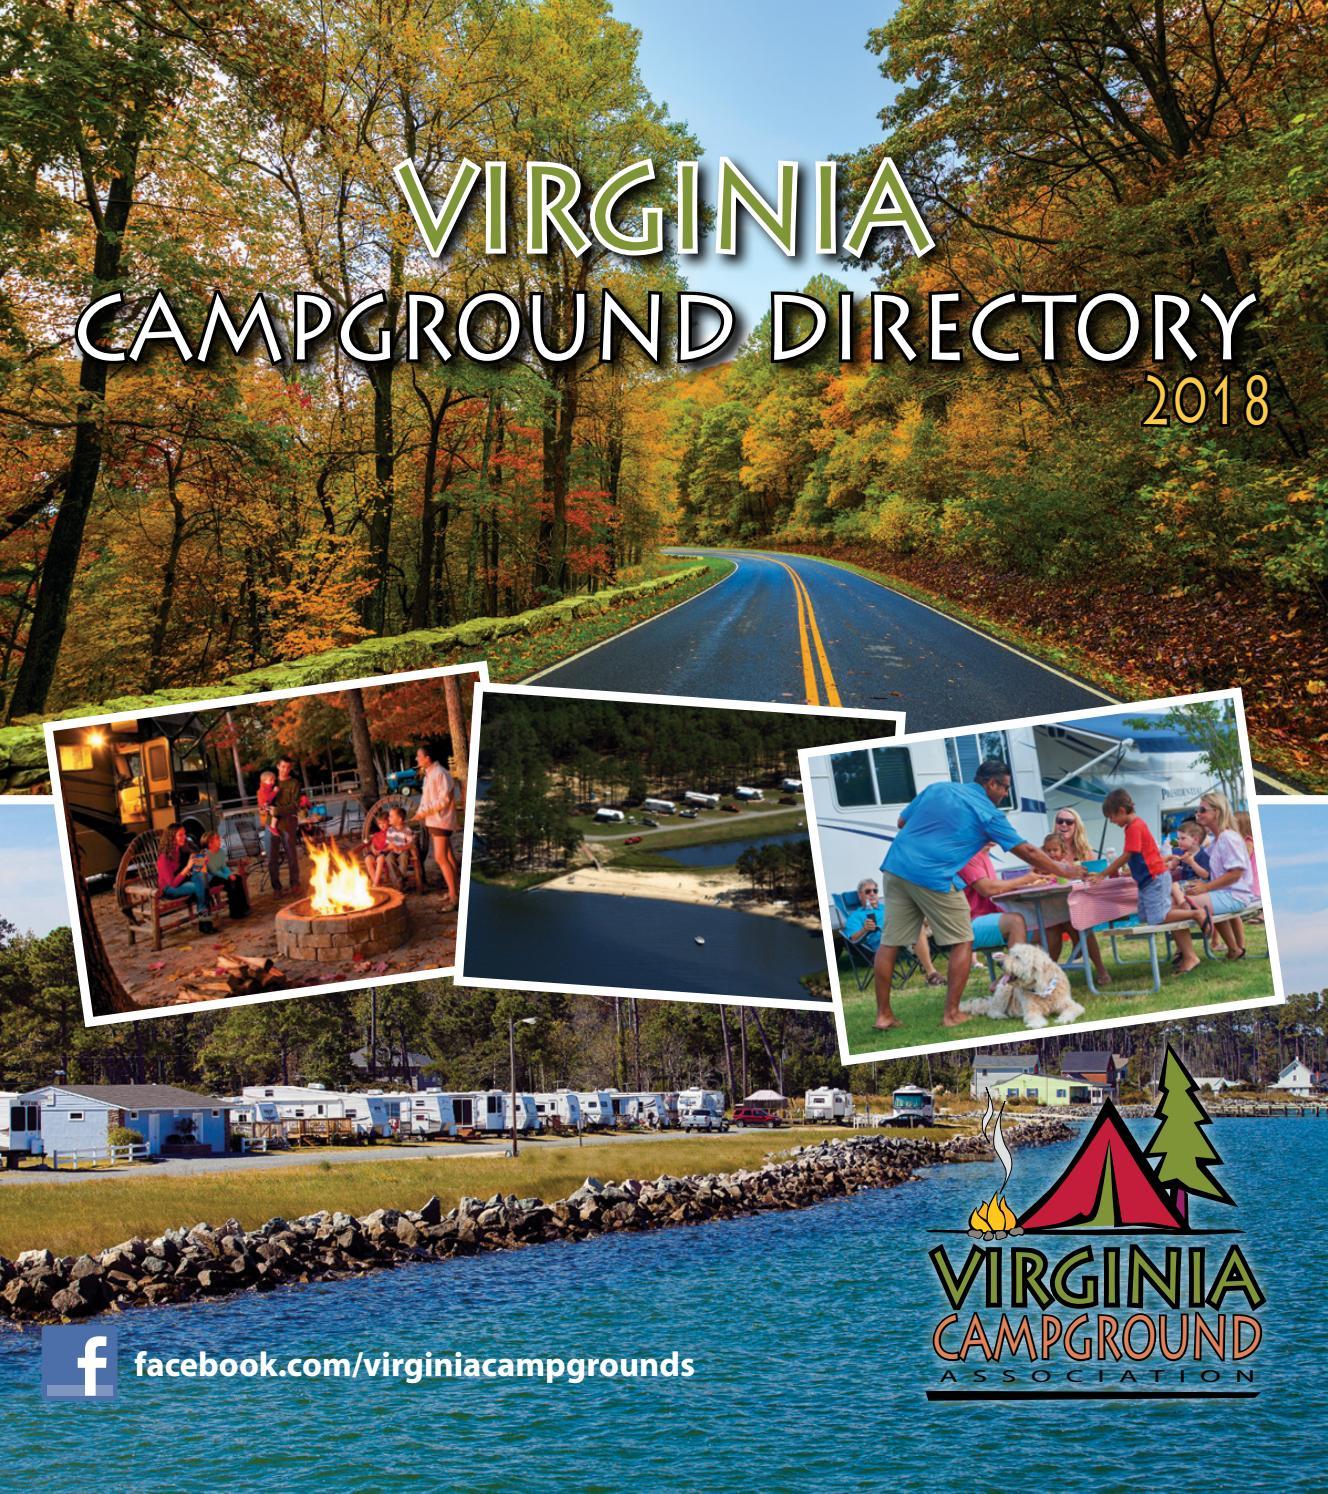 Virginia Campground Directory 2018 By Stallard Studios Publishing